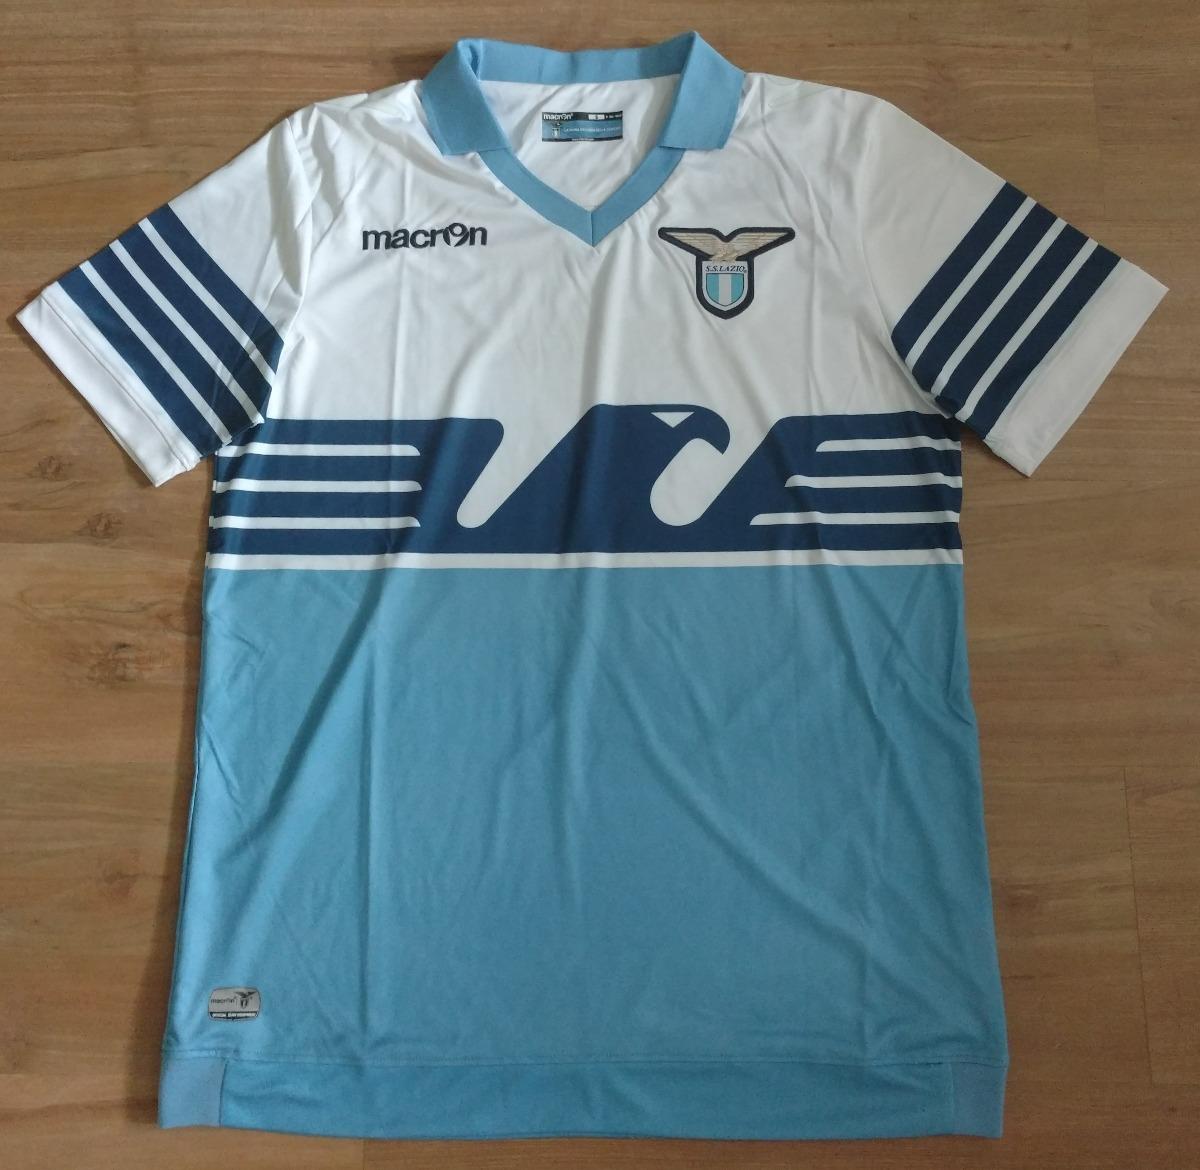 7c77ee70e4 Camisa Lazio Third 15/16 Klose 11 - R$ 150,00 em Mercado Livre